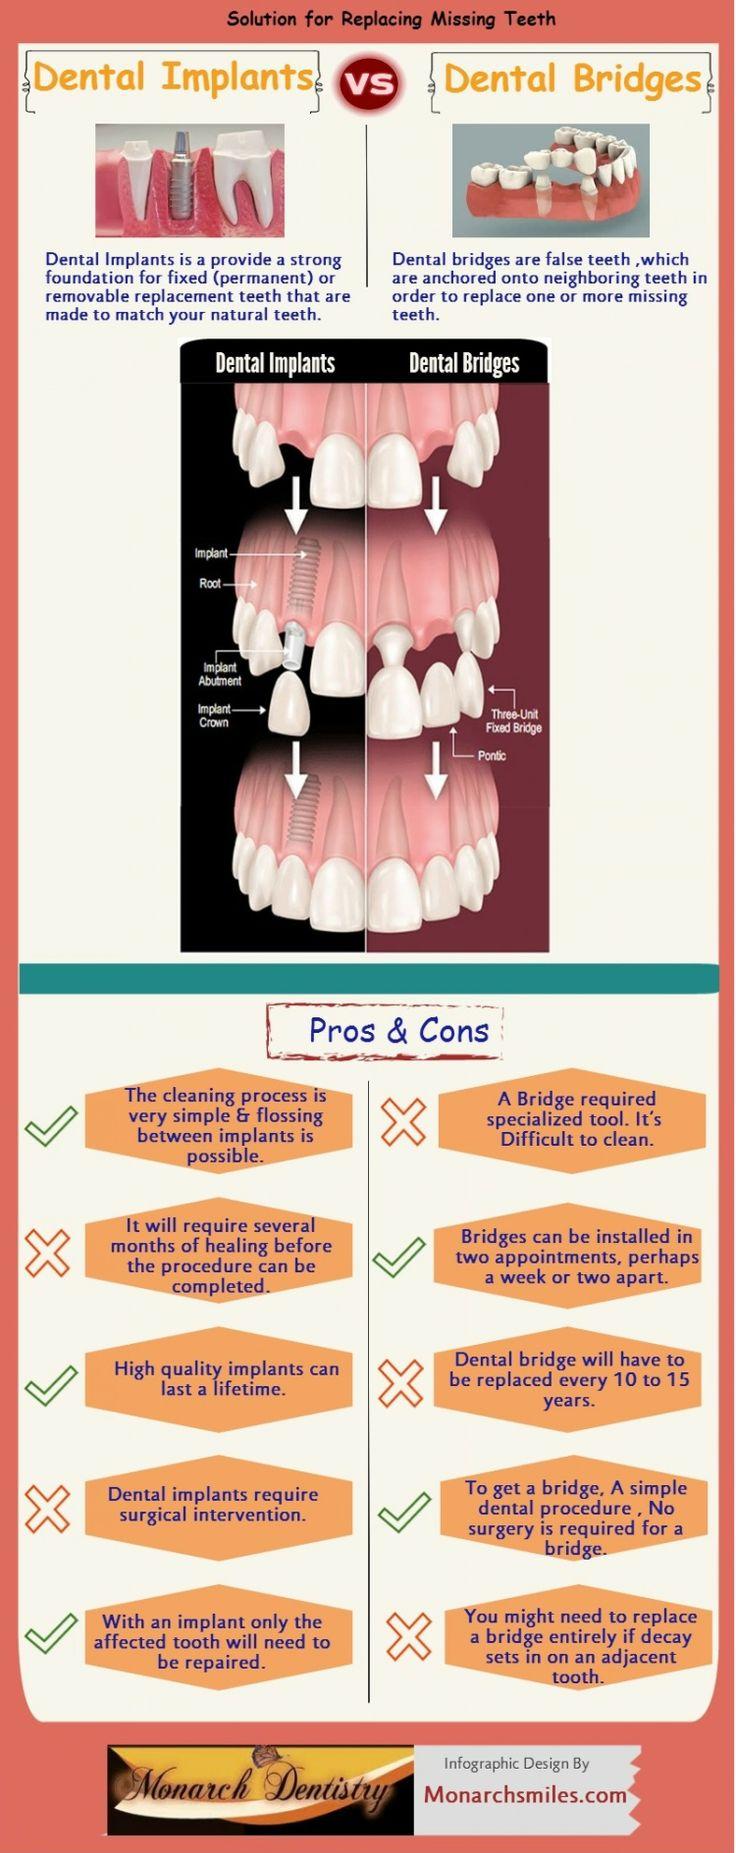 109 best Dental Facts images on Pinterest | Dental facts, Teeth ...